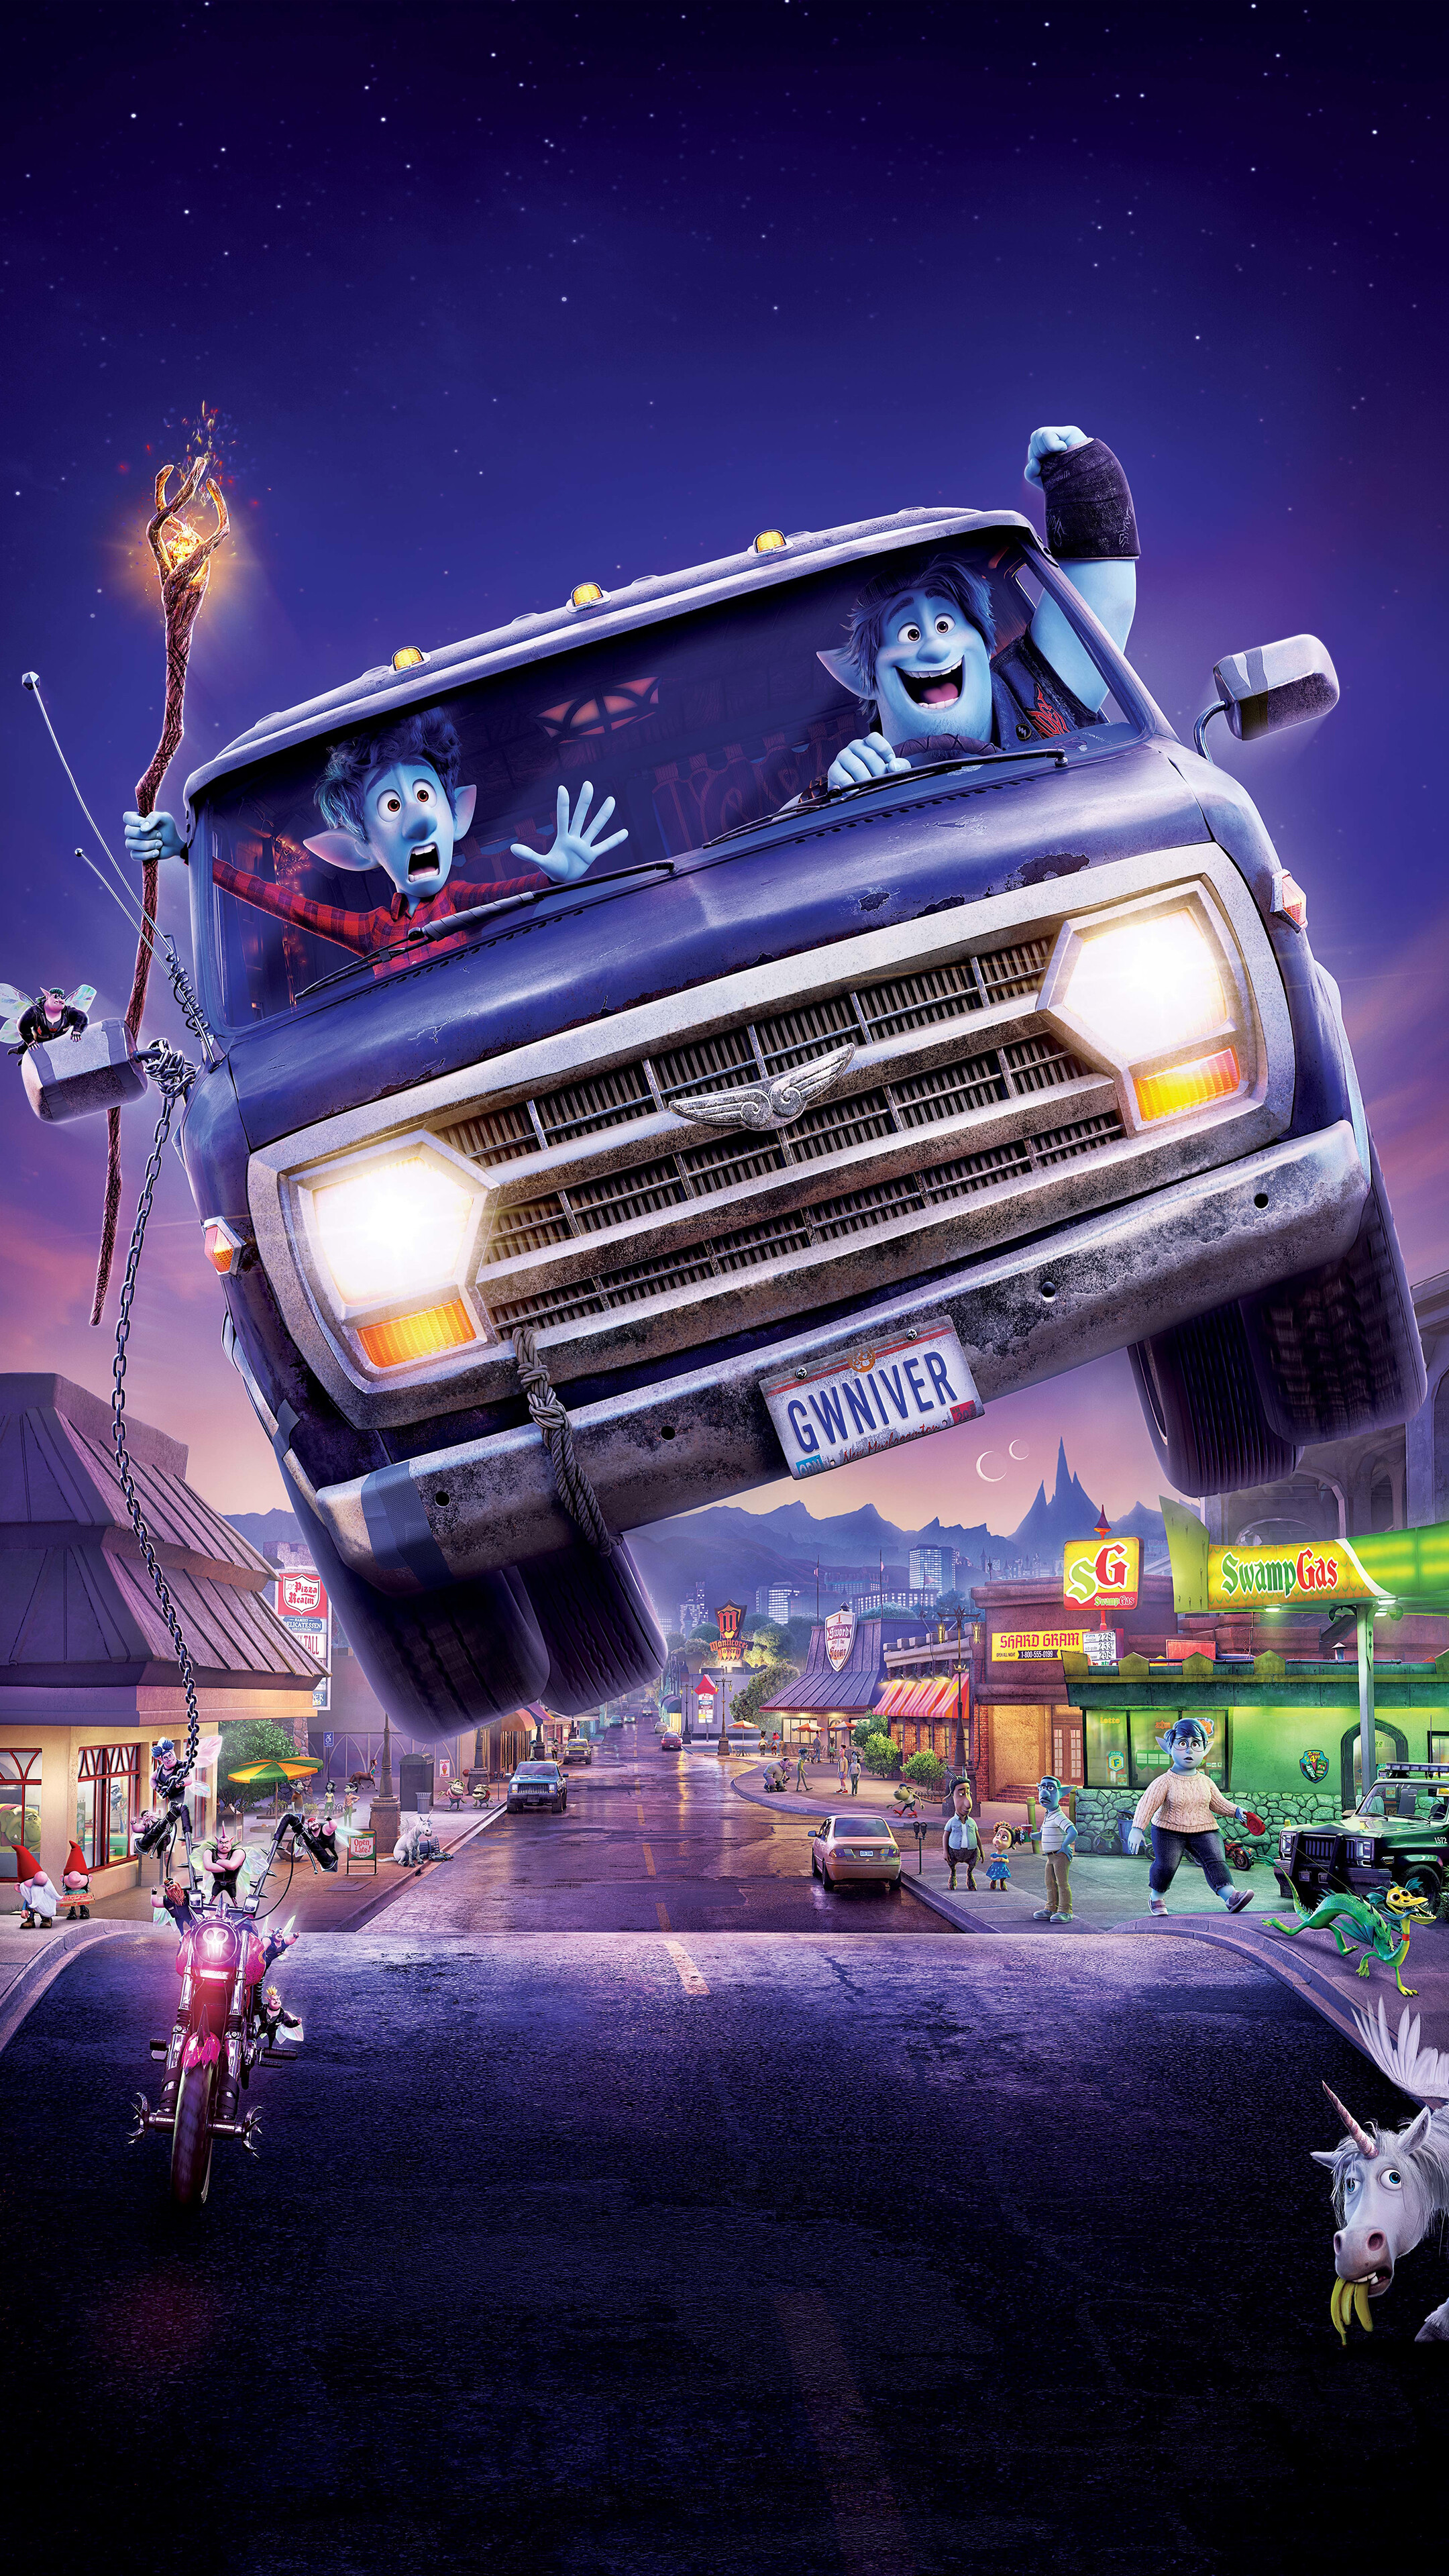 Onward Pixar Movie Poster 2020 Ian Barley 8K Wallpaper 51859 2160x3840